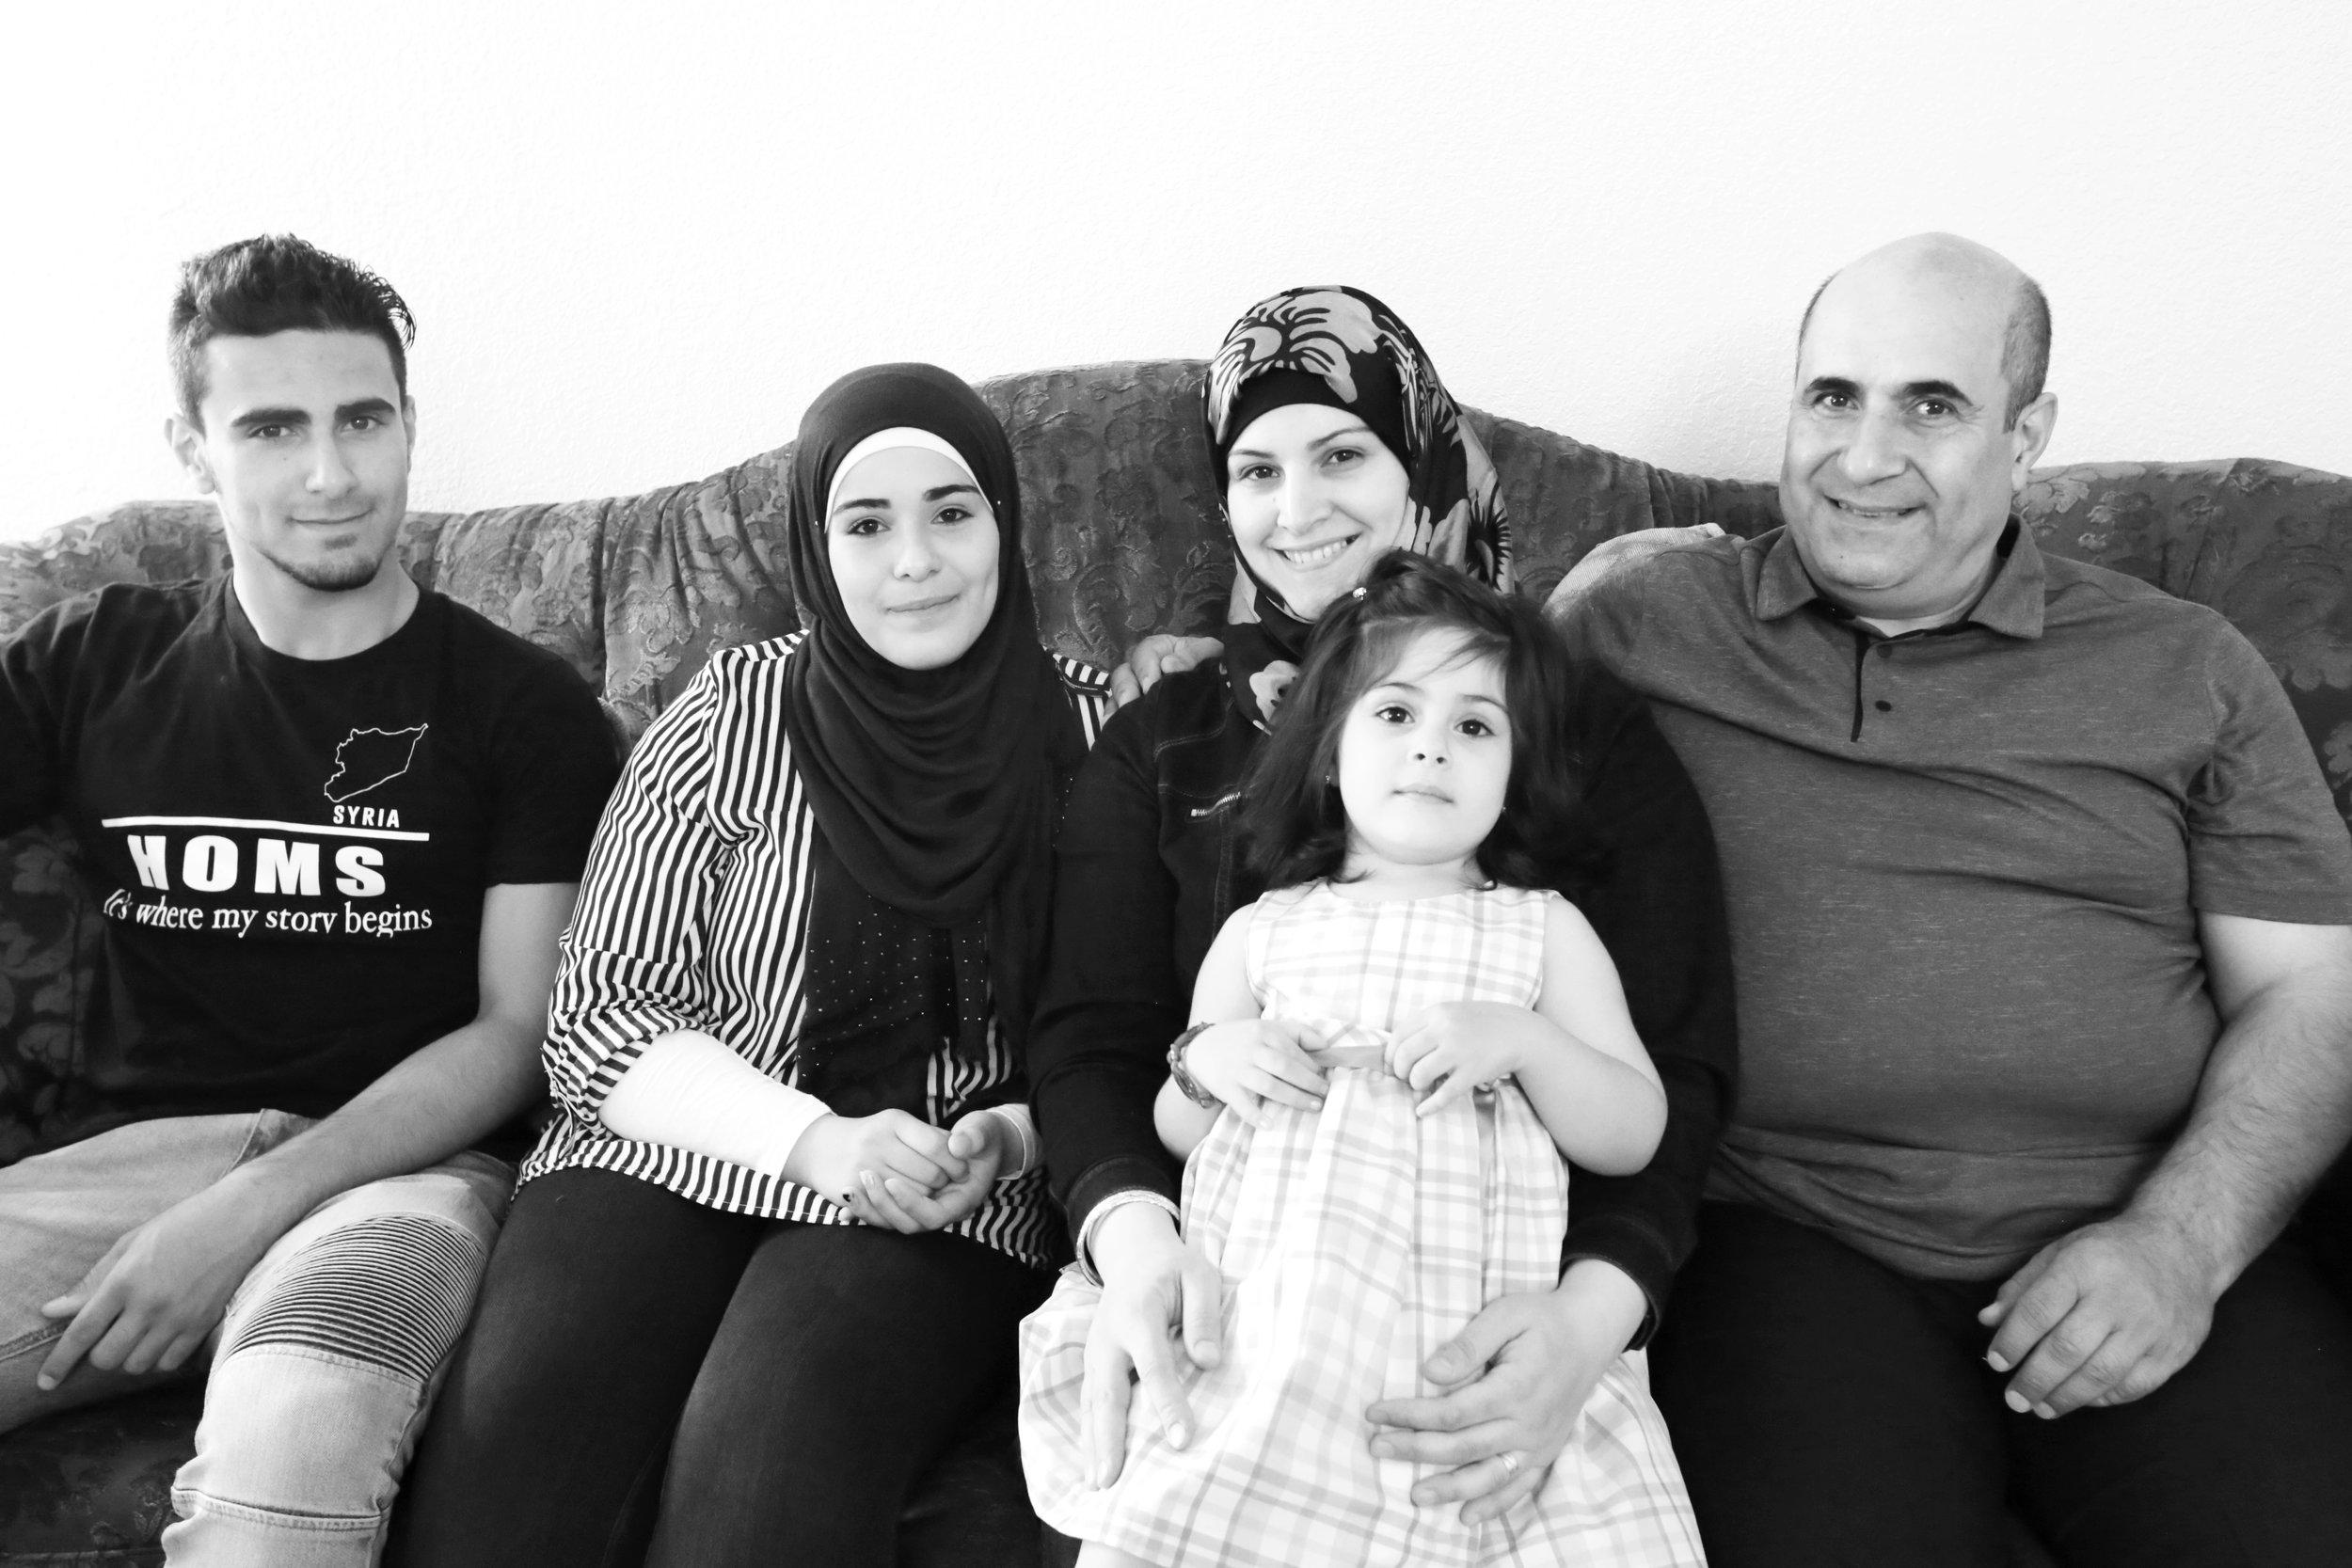 Left to Right: Basil, Deema, Nour, Lamar (Lulu), Thafer